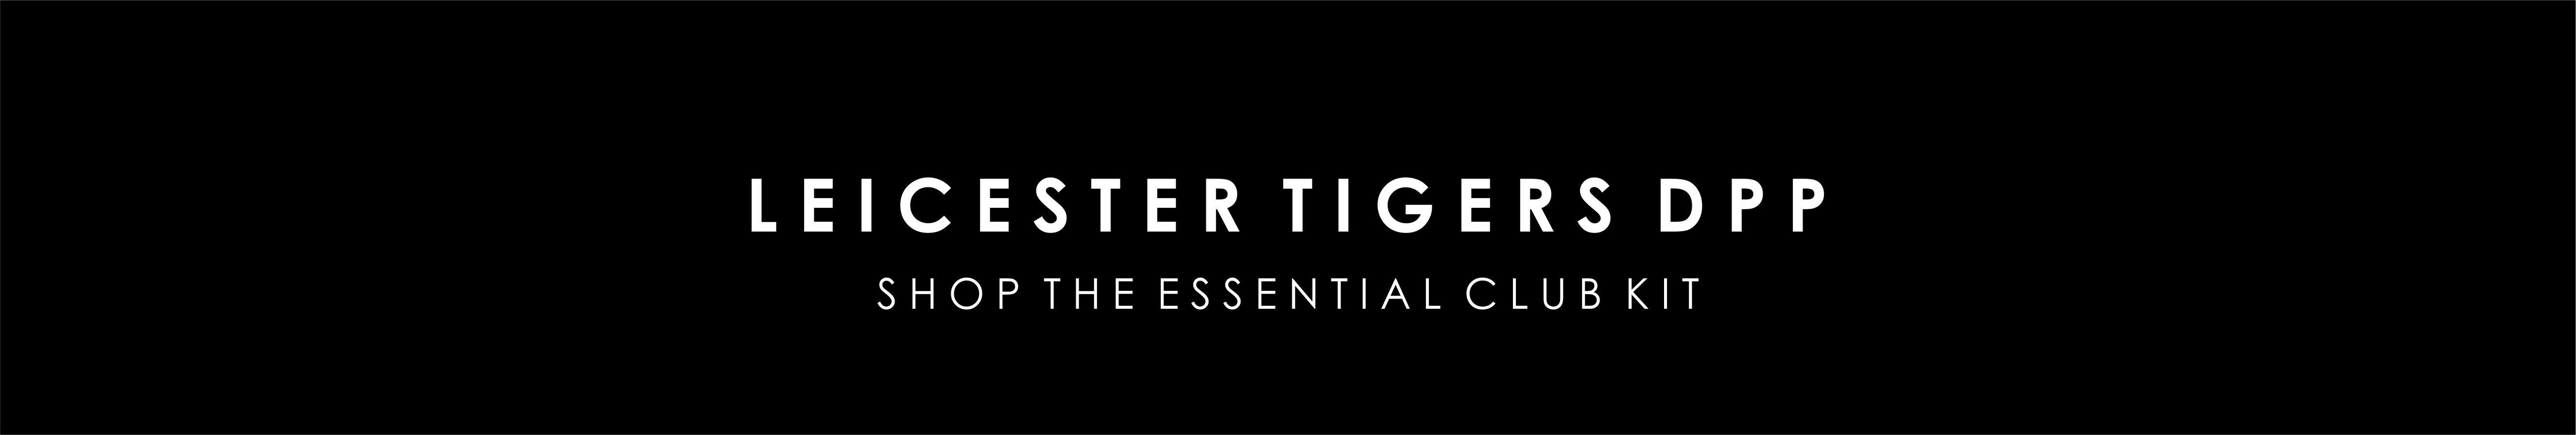 leciester-tigers-banner.jpg